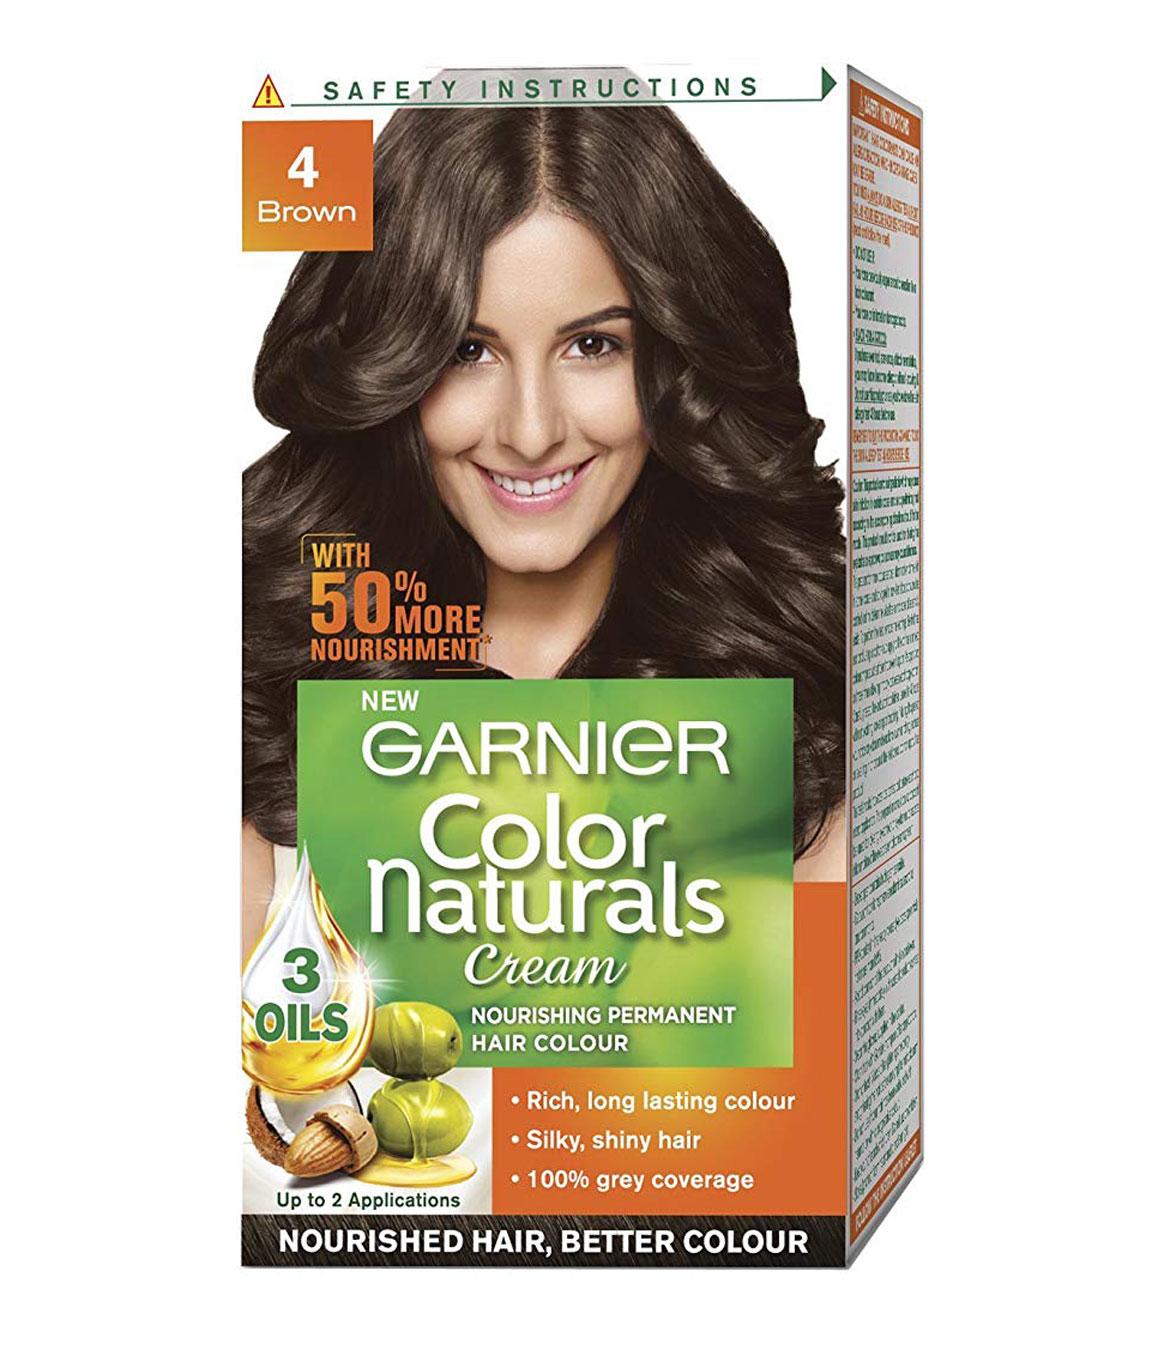 Garnier Color Naturals Mini Shade 4 Brown, 35ml + 30g